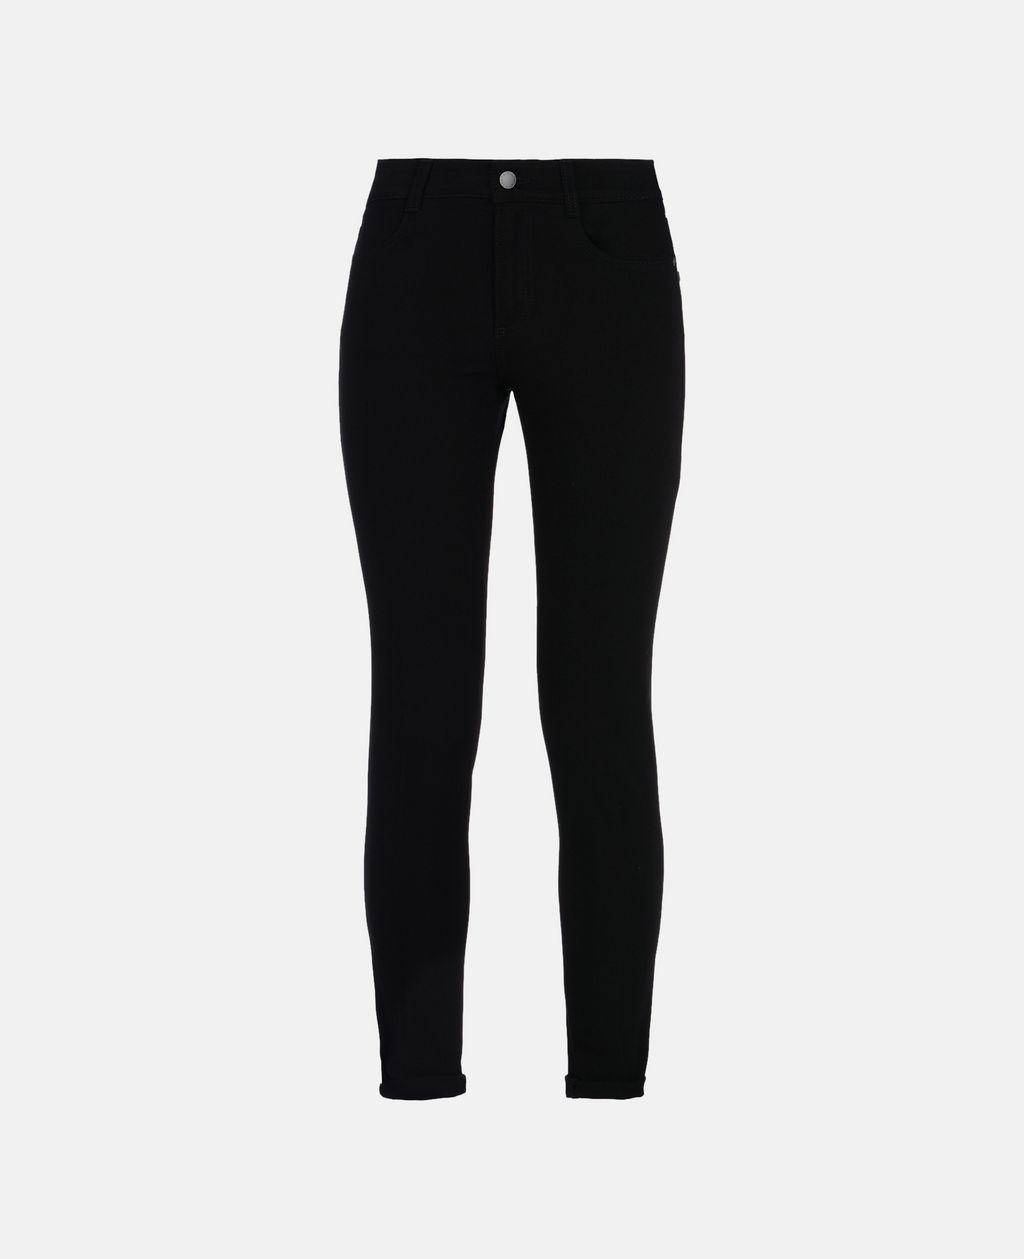 Black High Waisted Skinny Jeans - STELLA MCCARTNEY